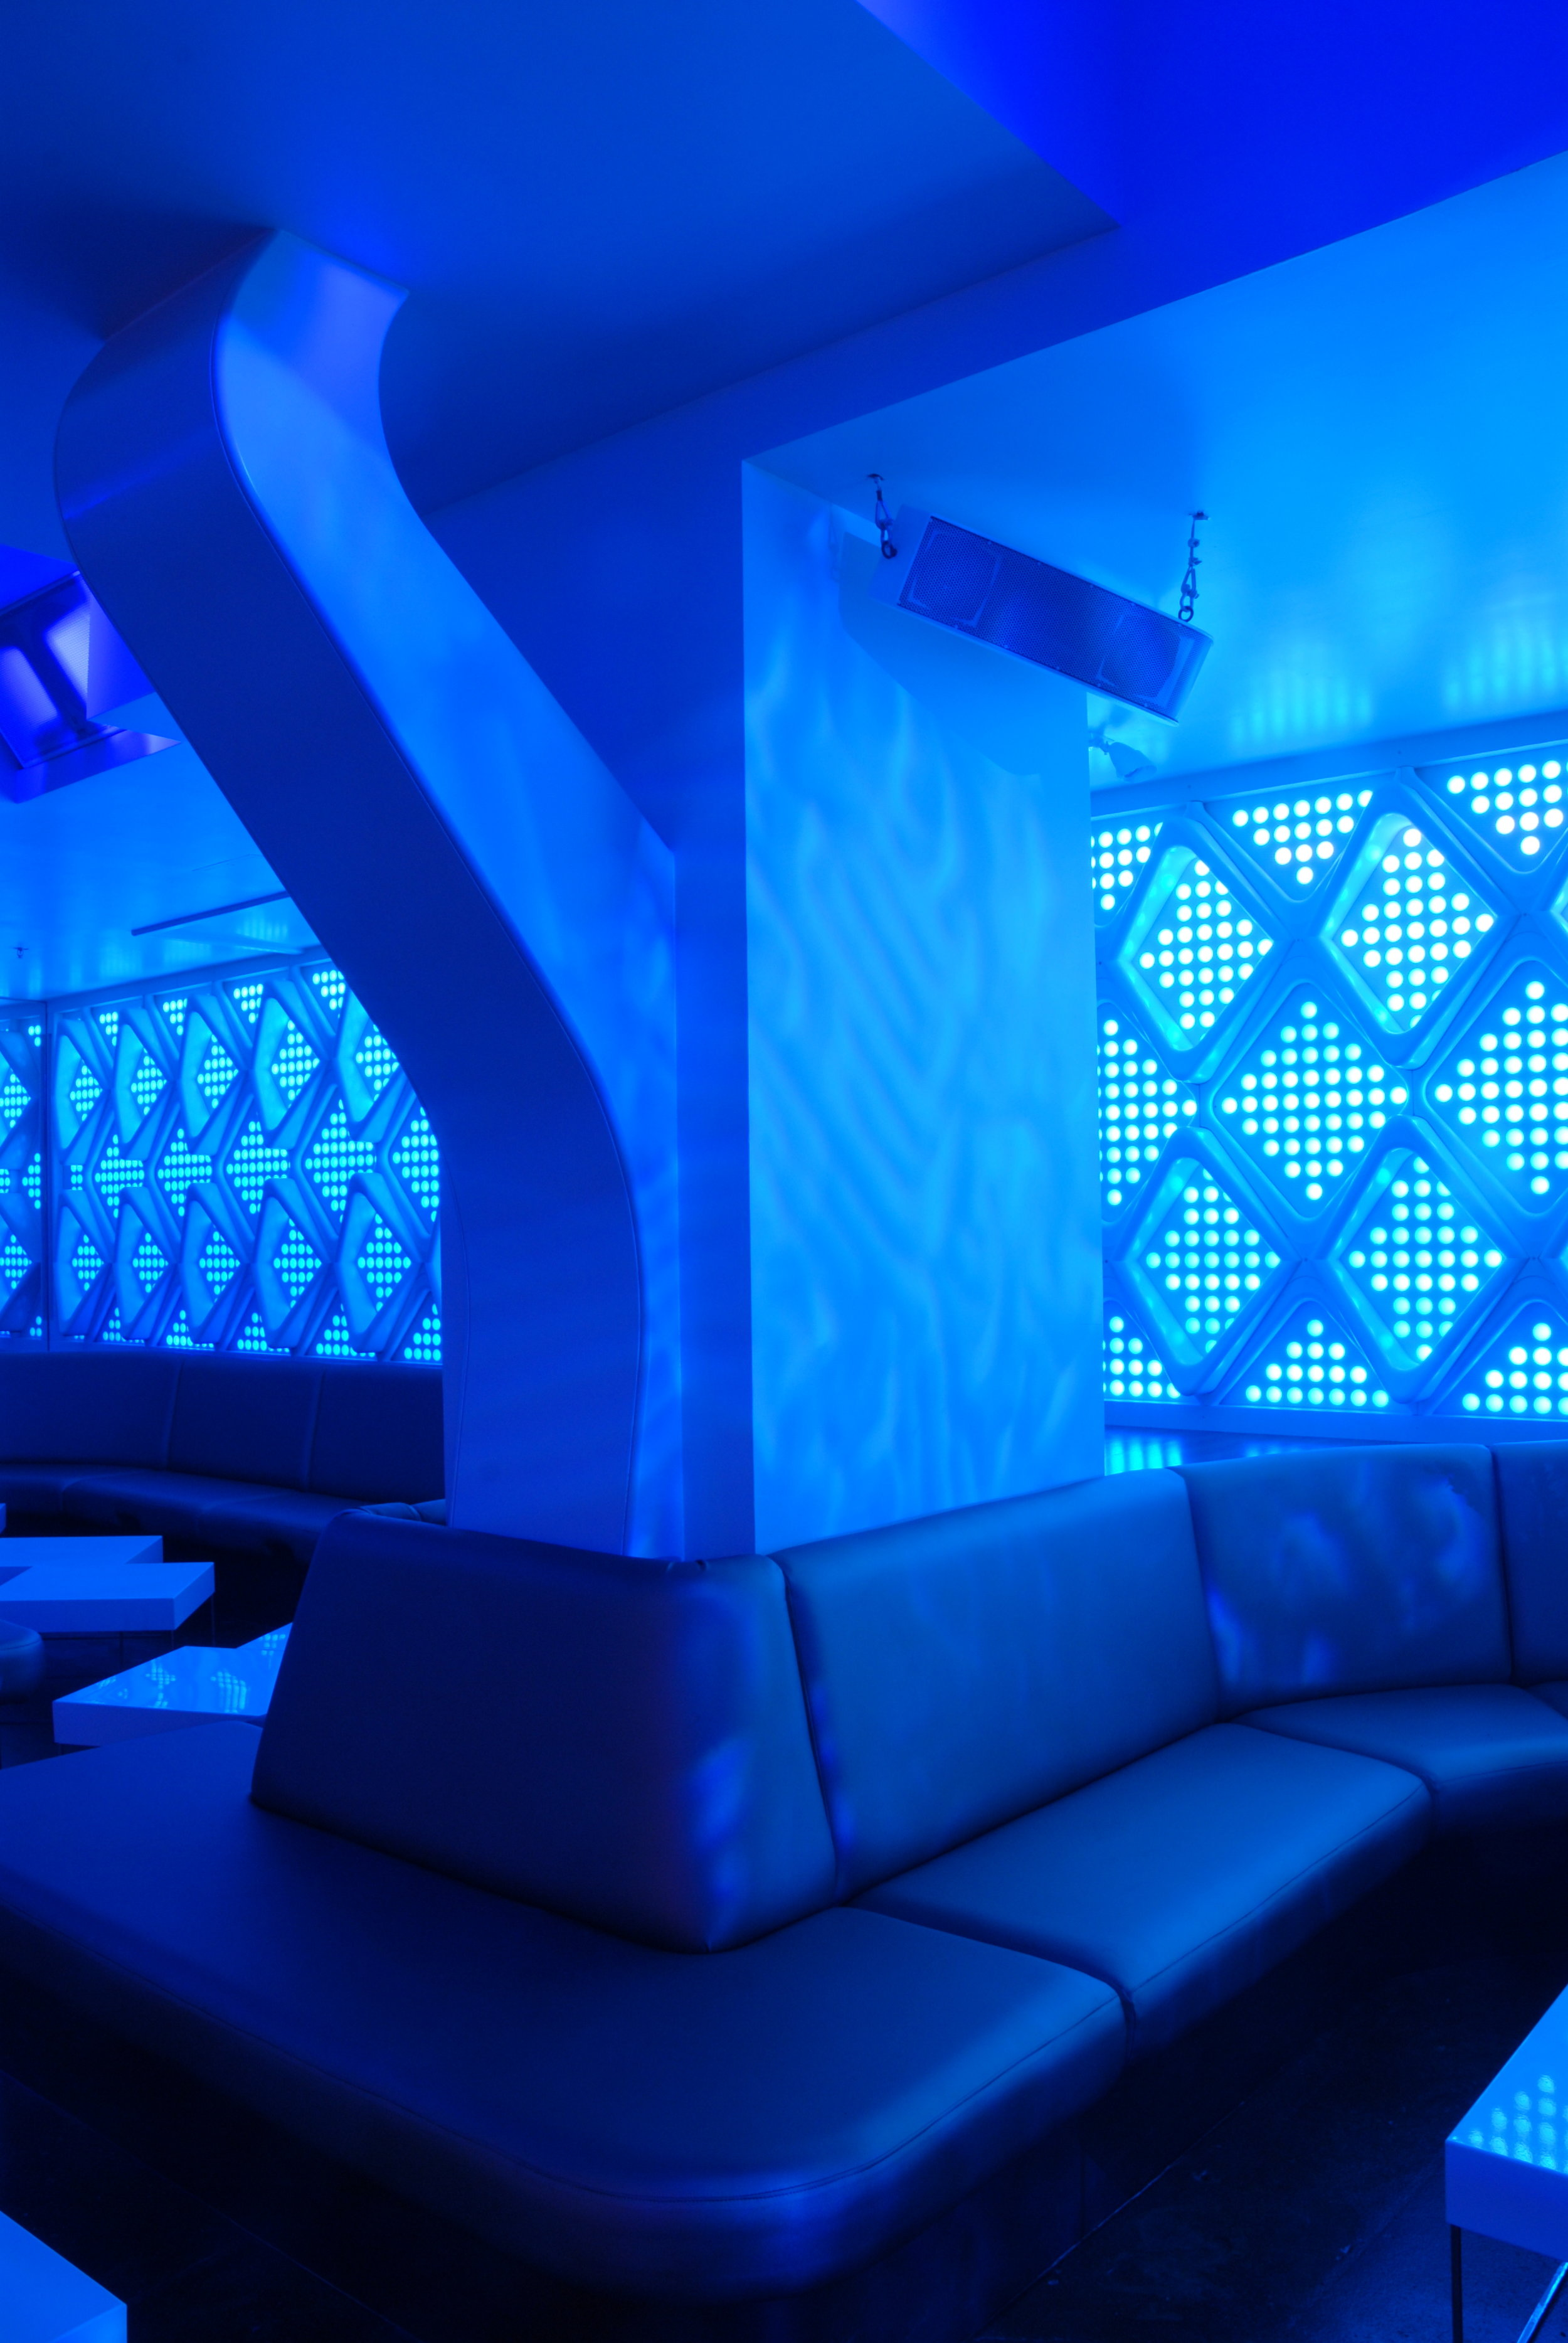 studio-saint-bars-and-restaurants-lotus-lounge-washington-dc-7